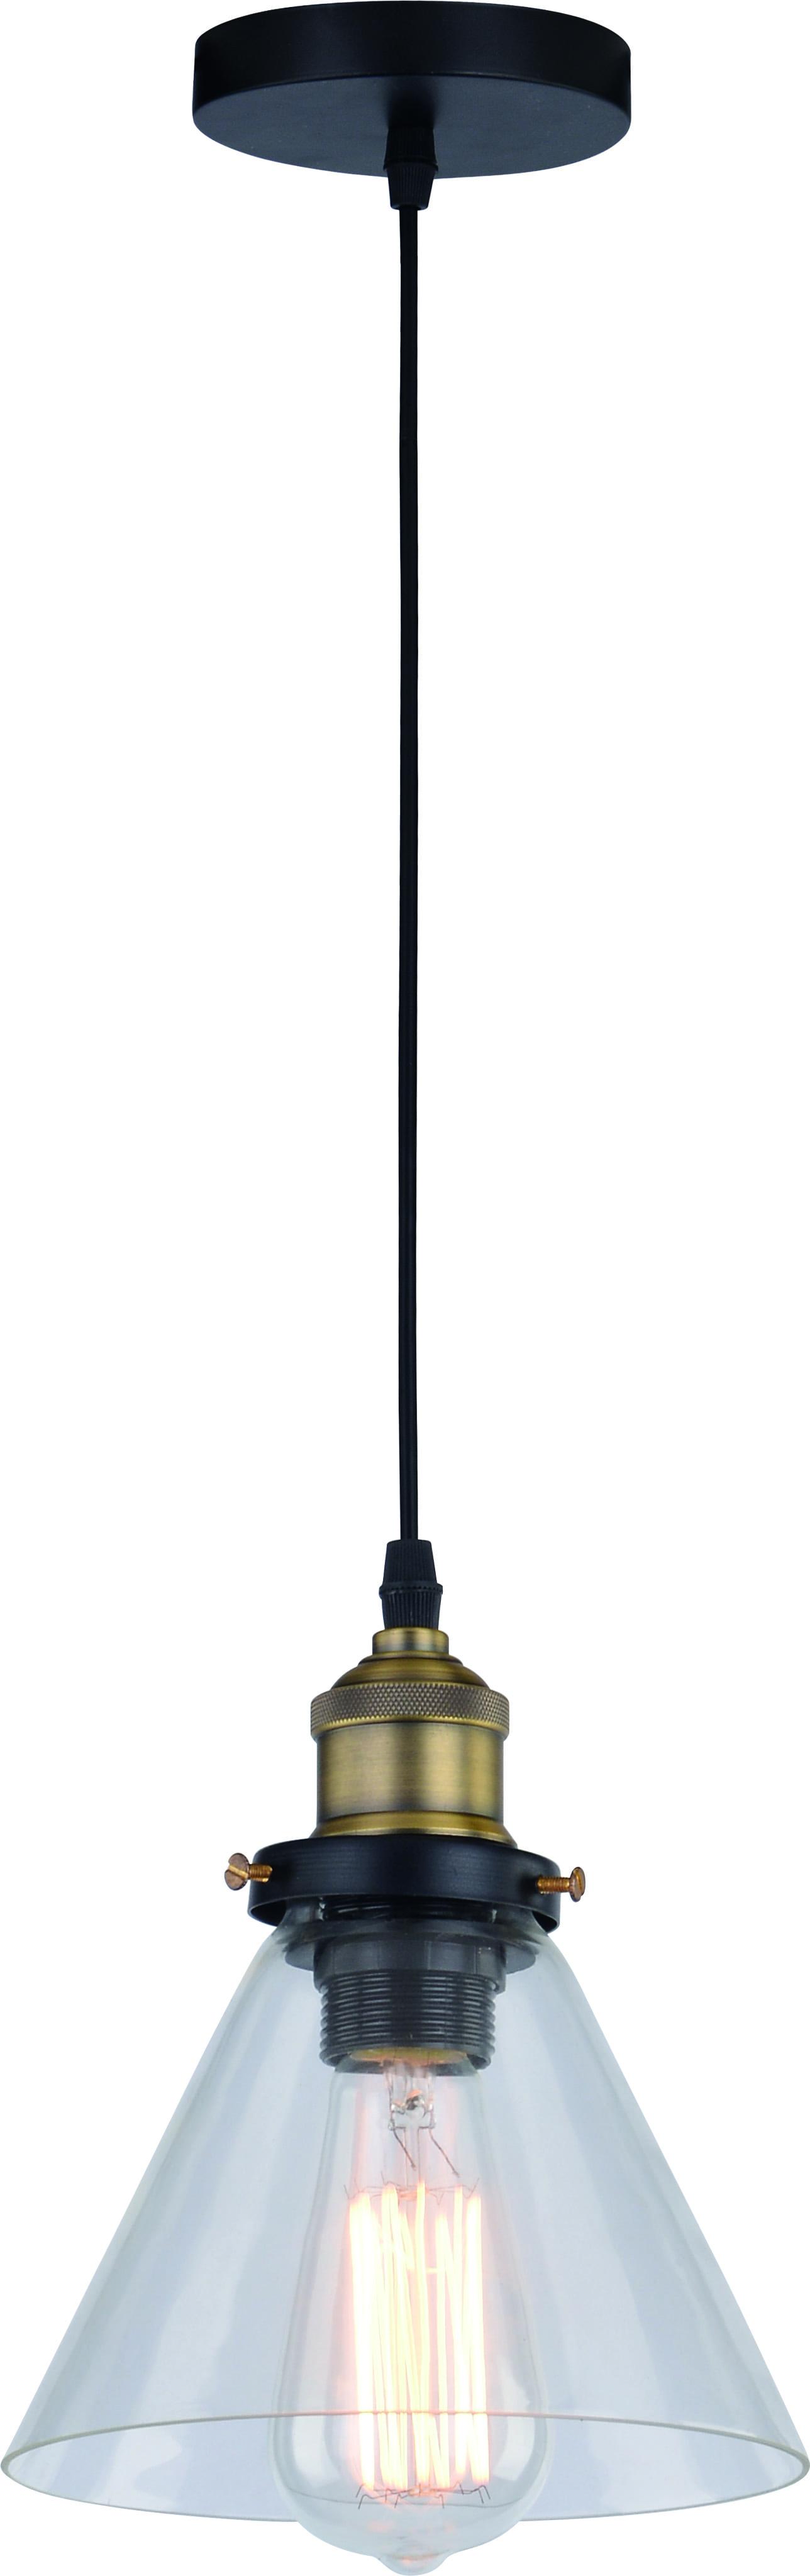 Hanging lamp Conrad transparent lampshade 60W